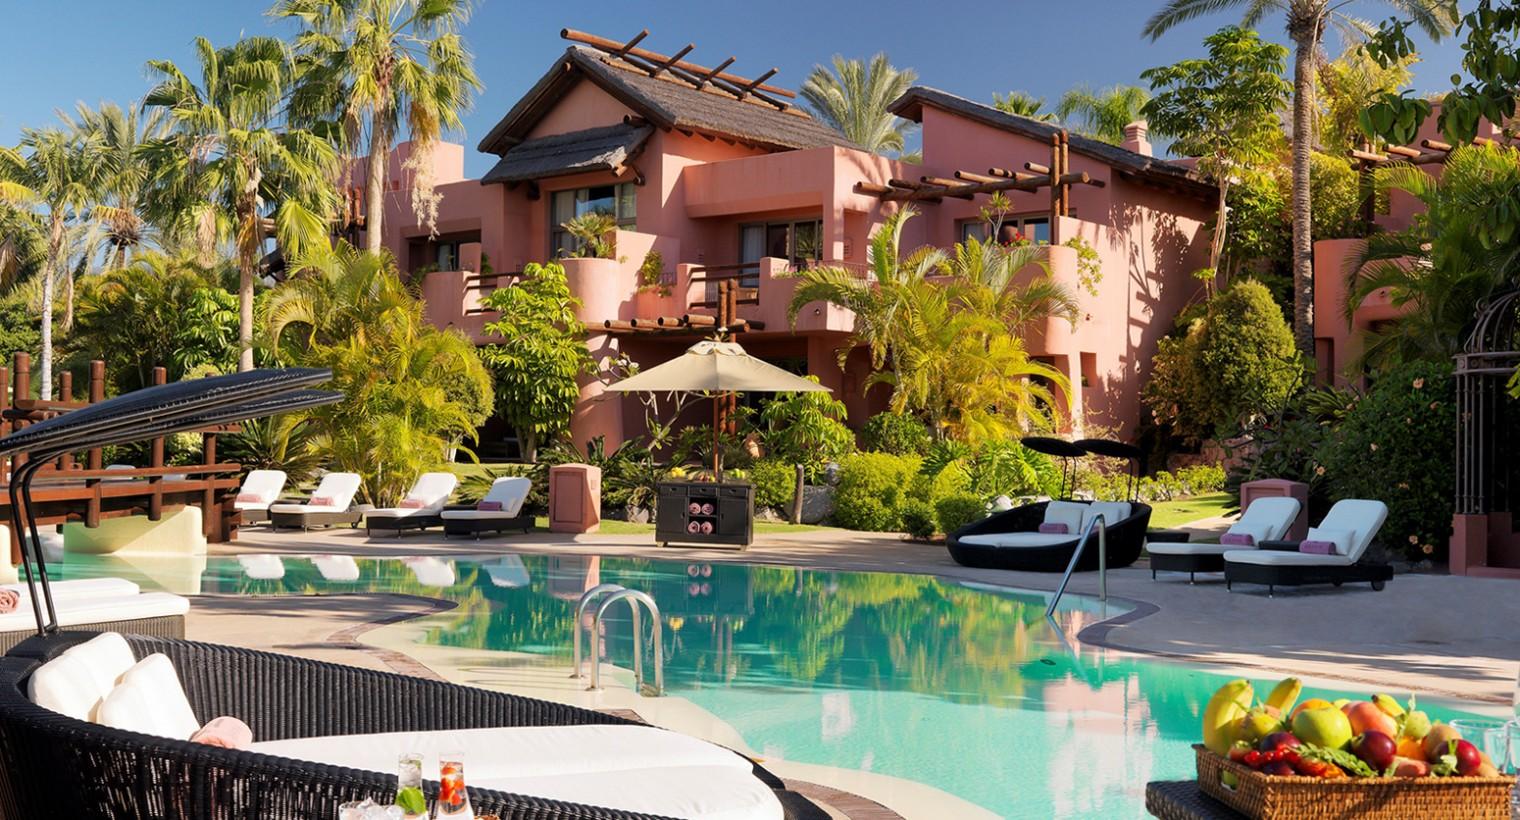 Golf Resort Ritz Carlton Abama 5* + Abama Experience pack